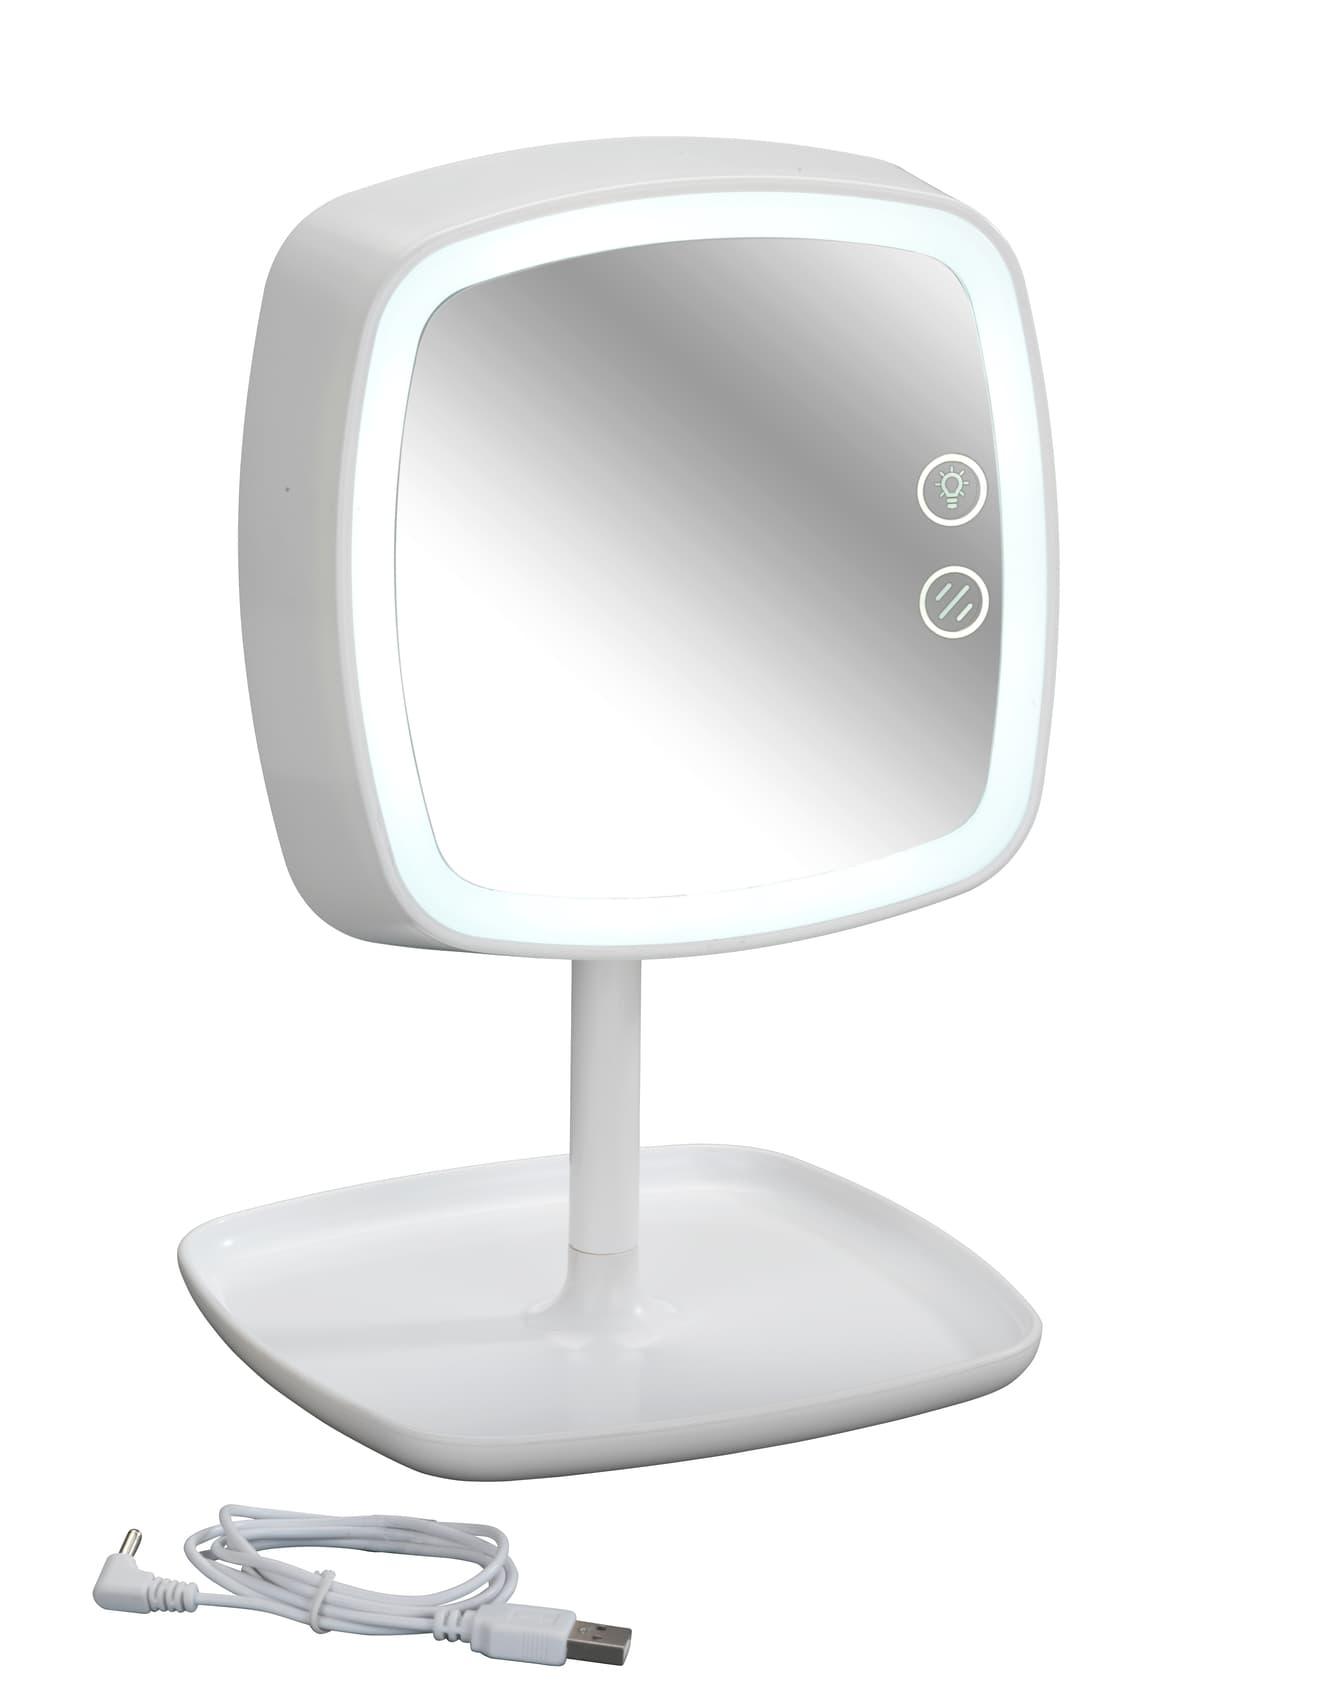 Oglinda cosmetica tactila cu lampa LED din plastic, cablu USB, Ostia Alb, L19xl18xH29 cm poza